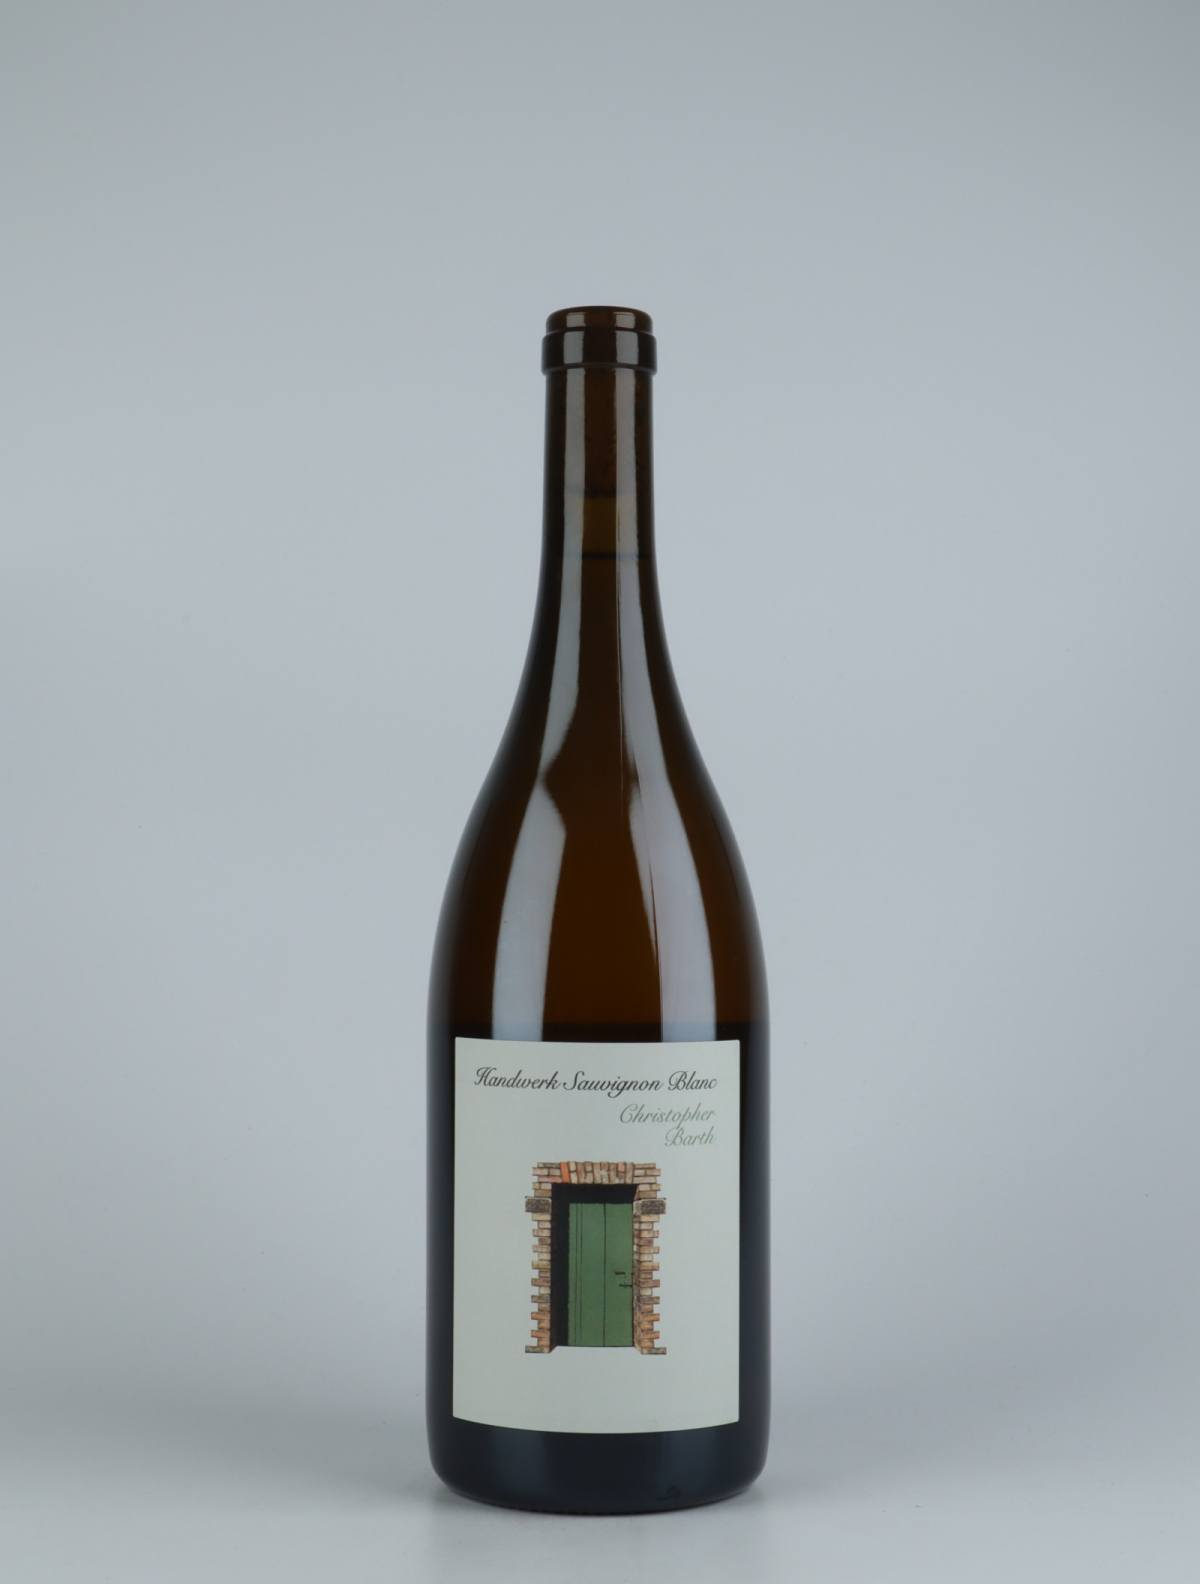 Handwerk Sauvignon Blanc